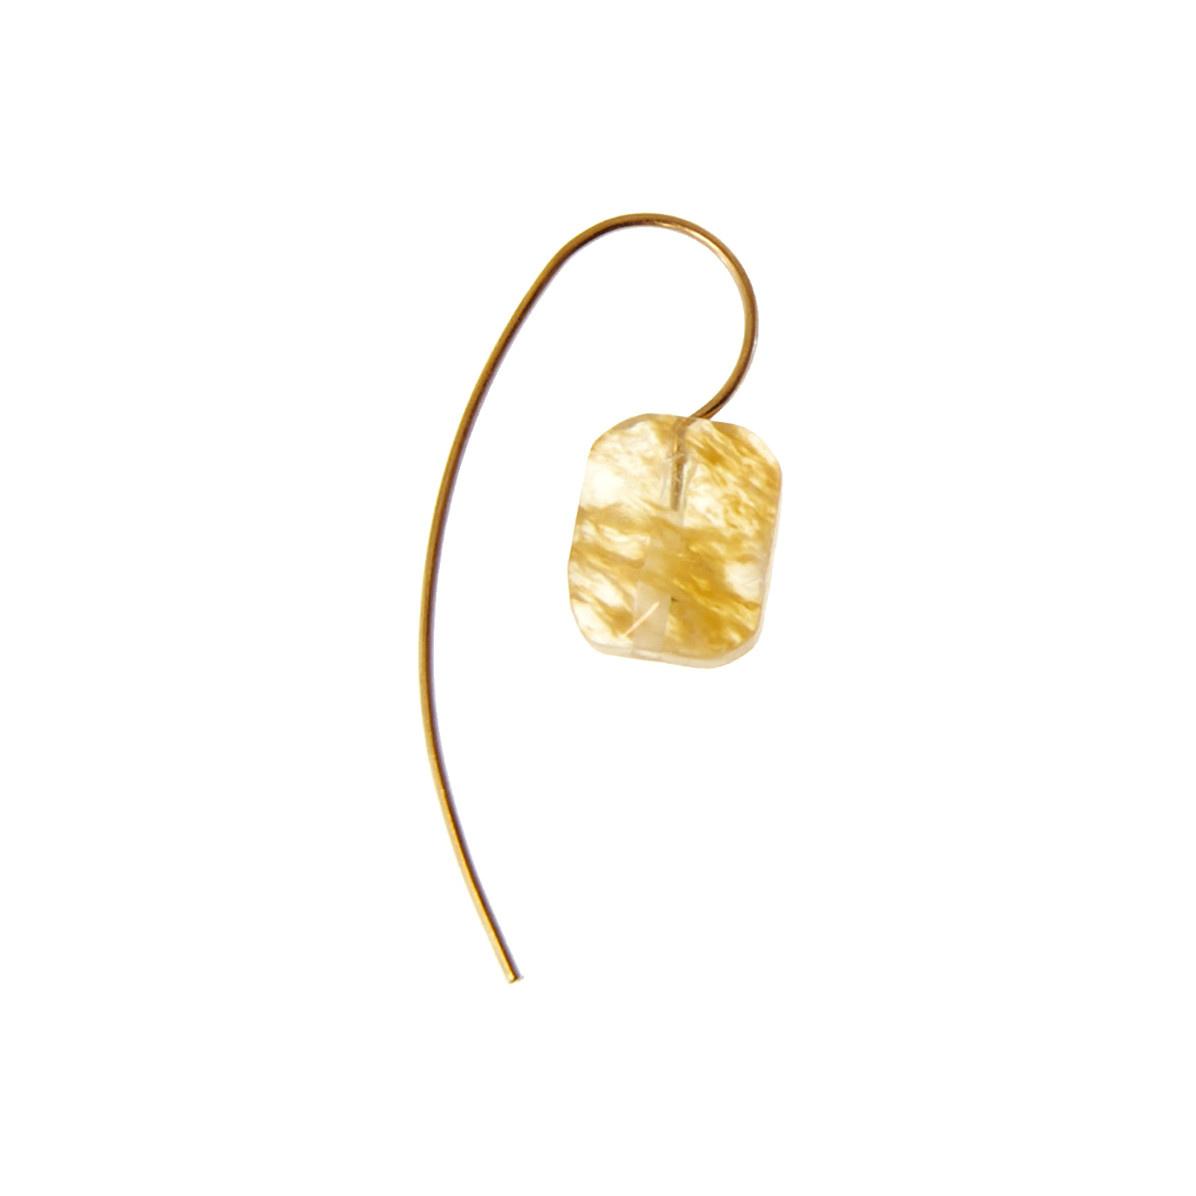 Joy Susan Joy Susan Gold Threader Earrings Natural Stone